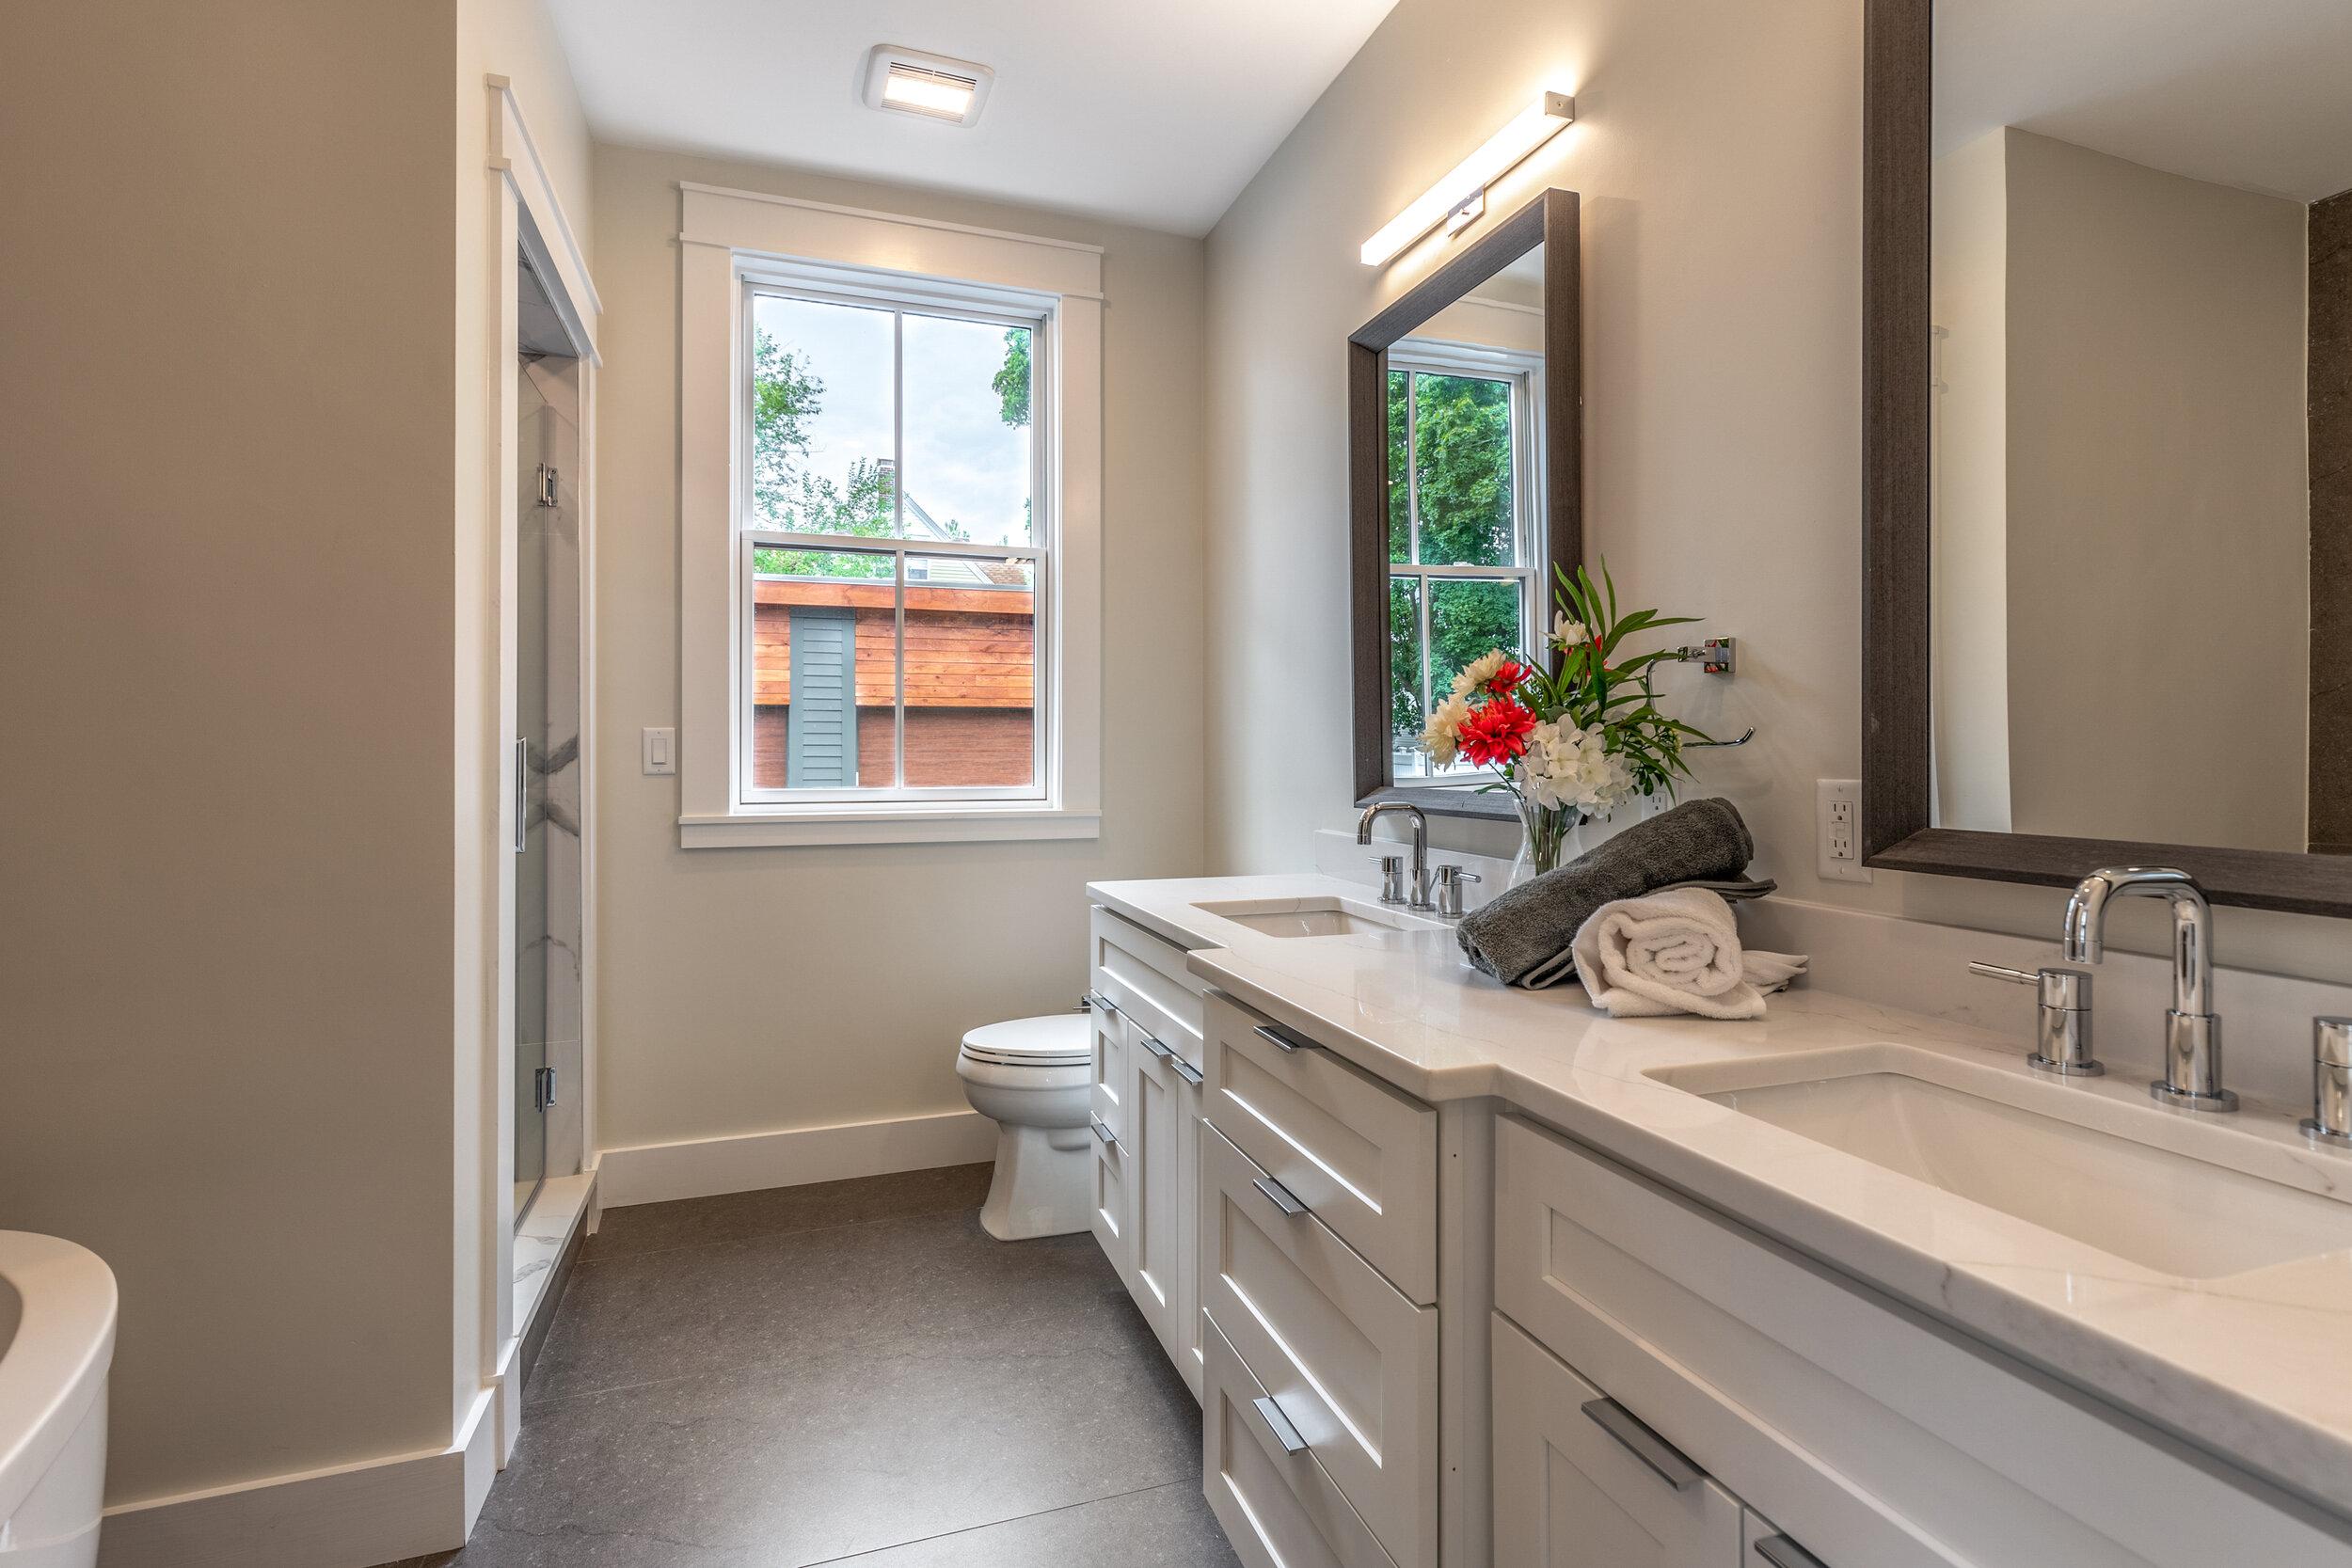 19_Bathroom-4.jpg